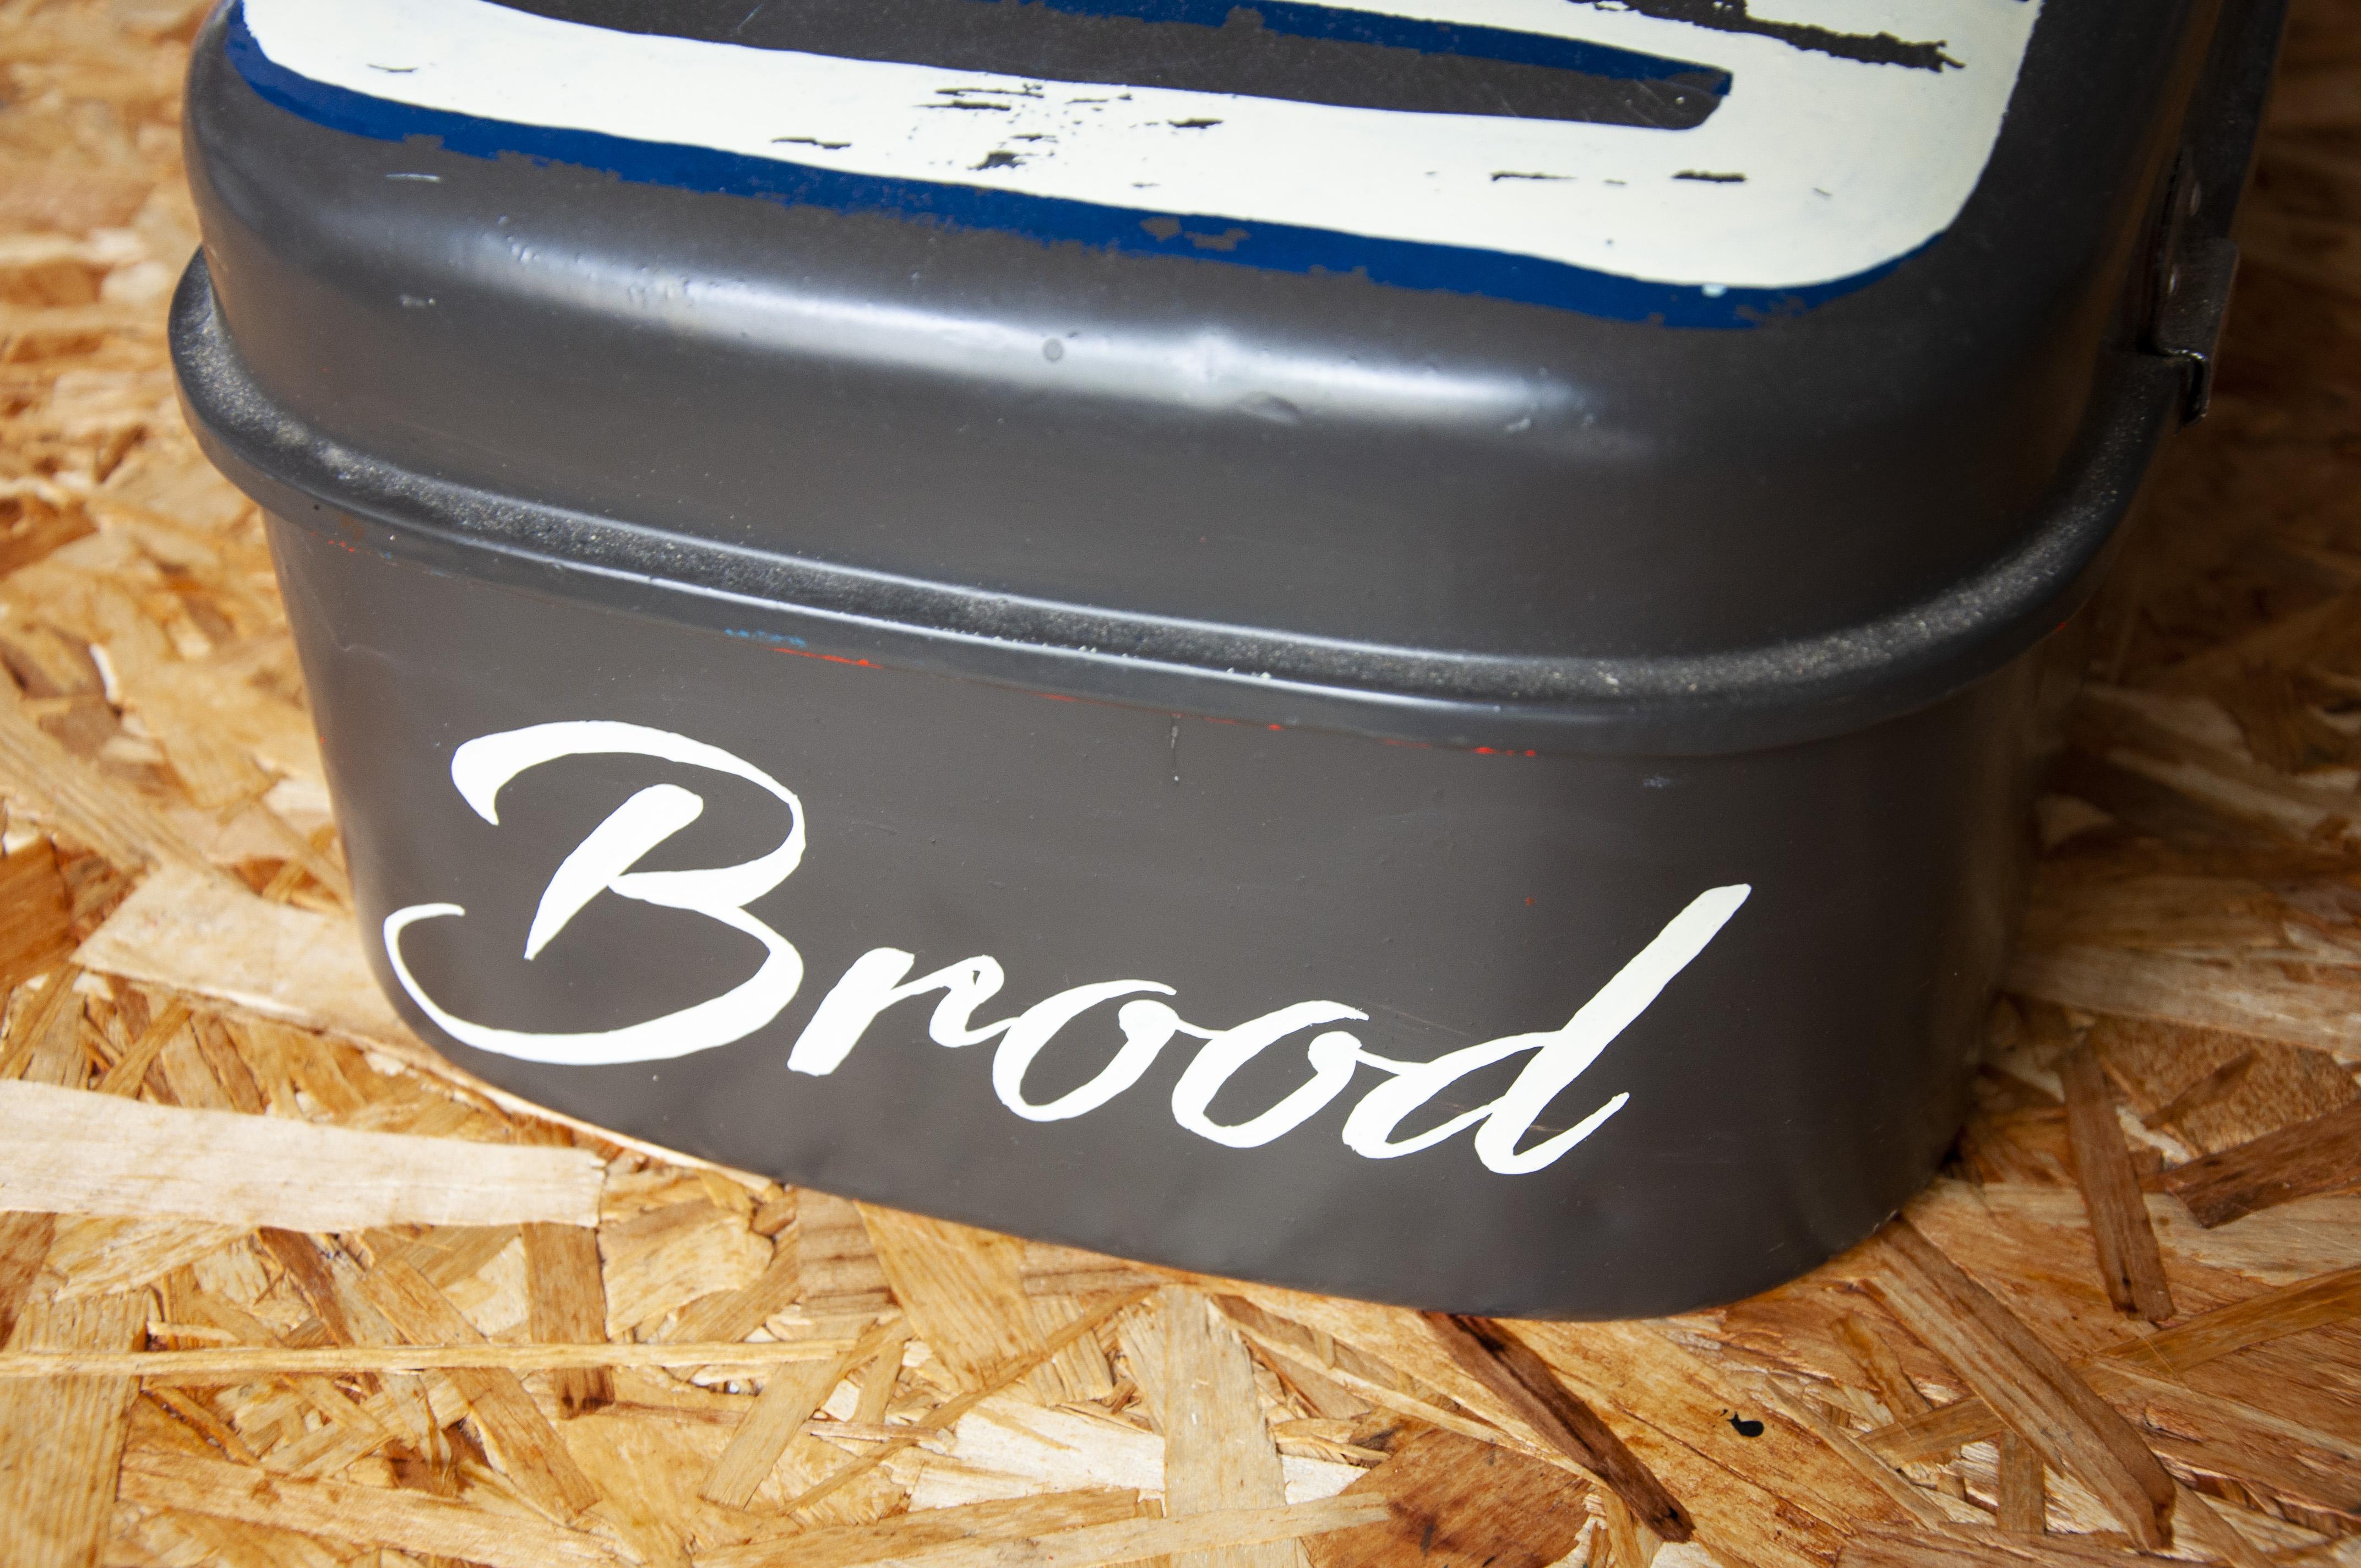 Broodtrommel_1